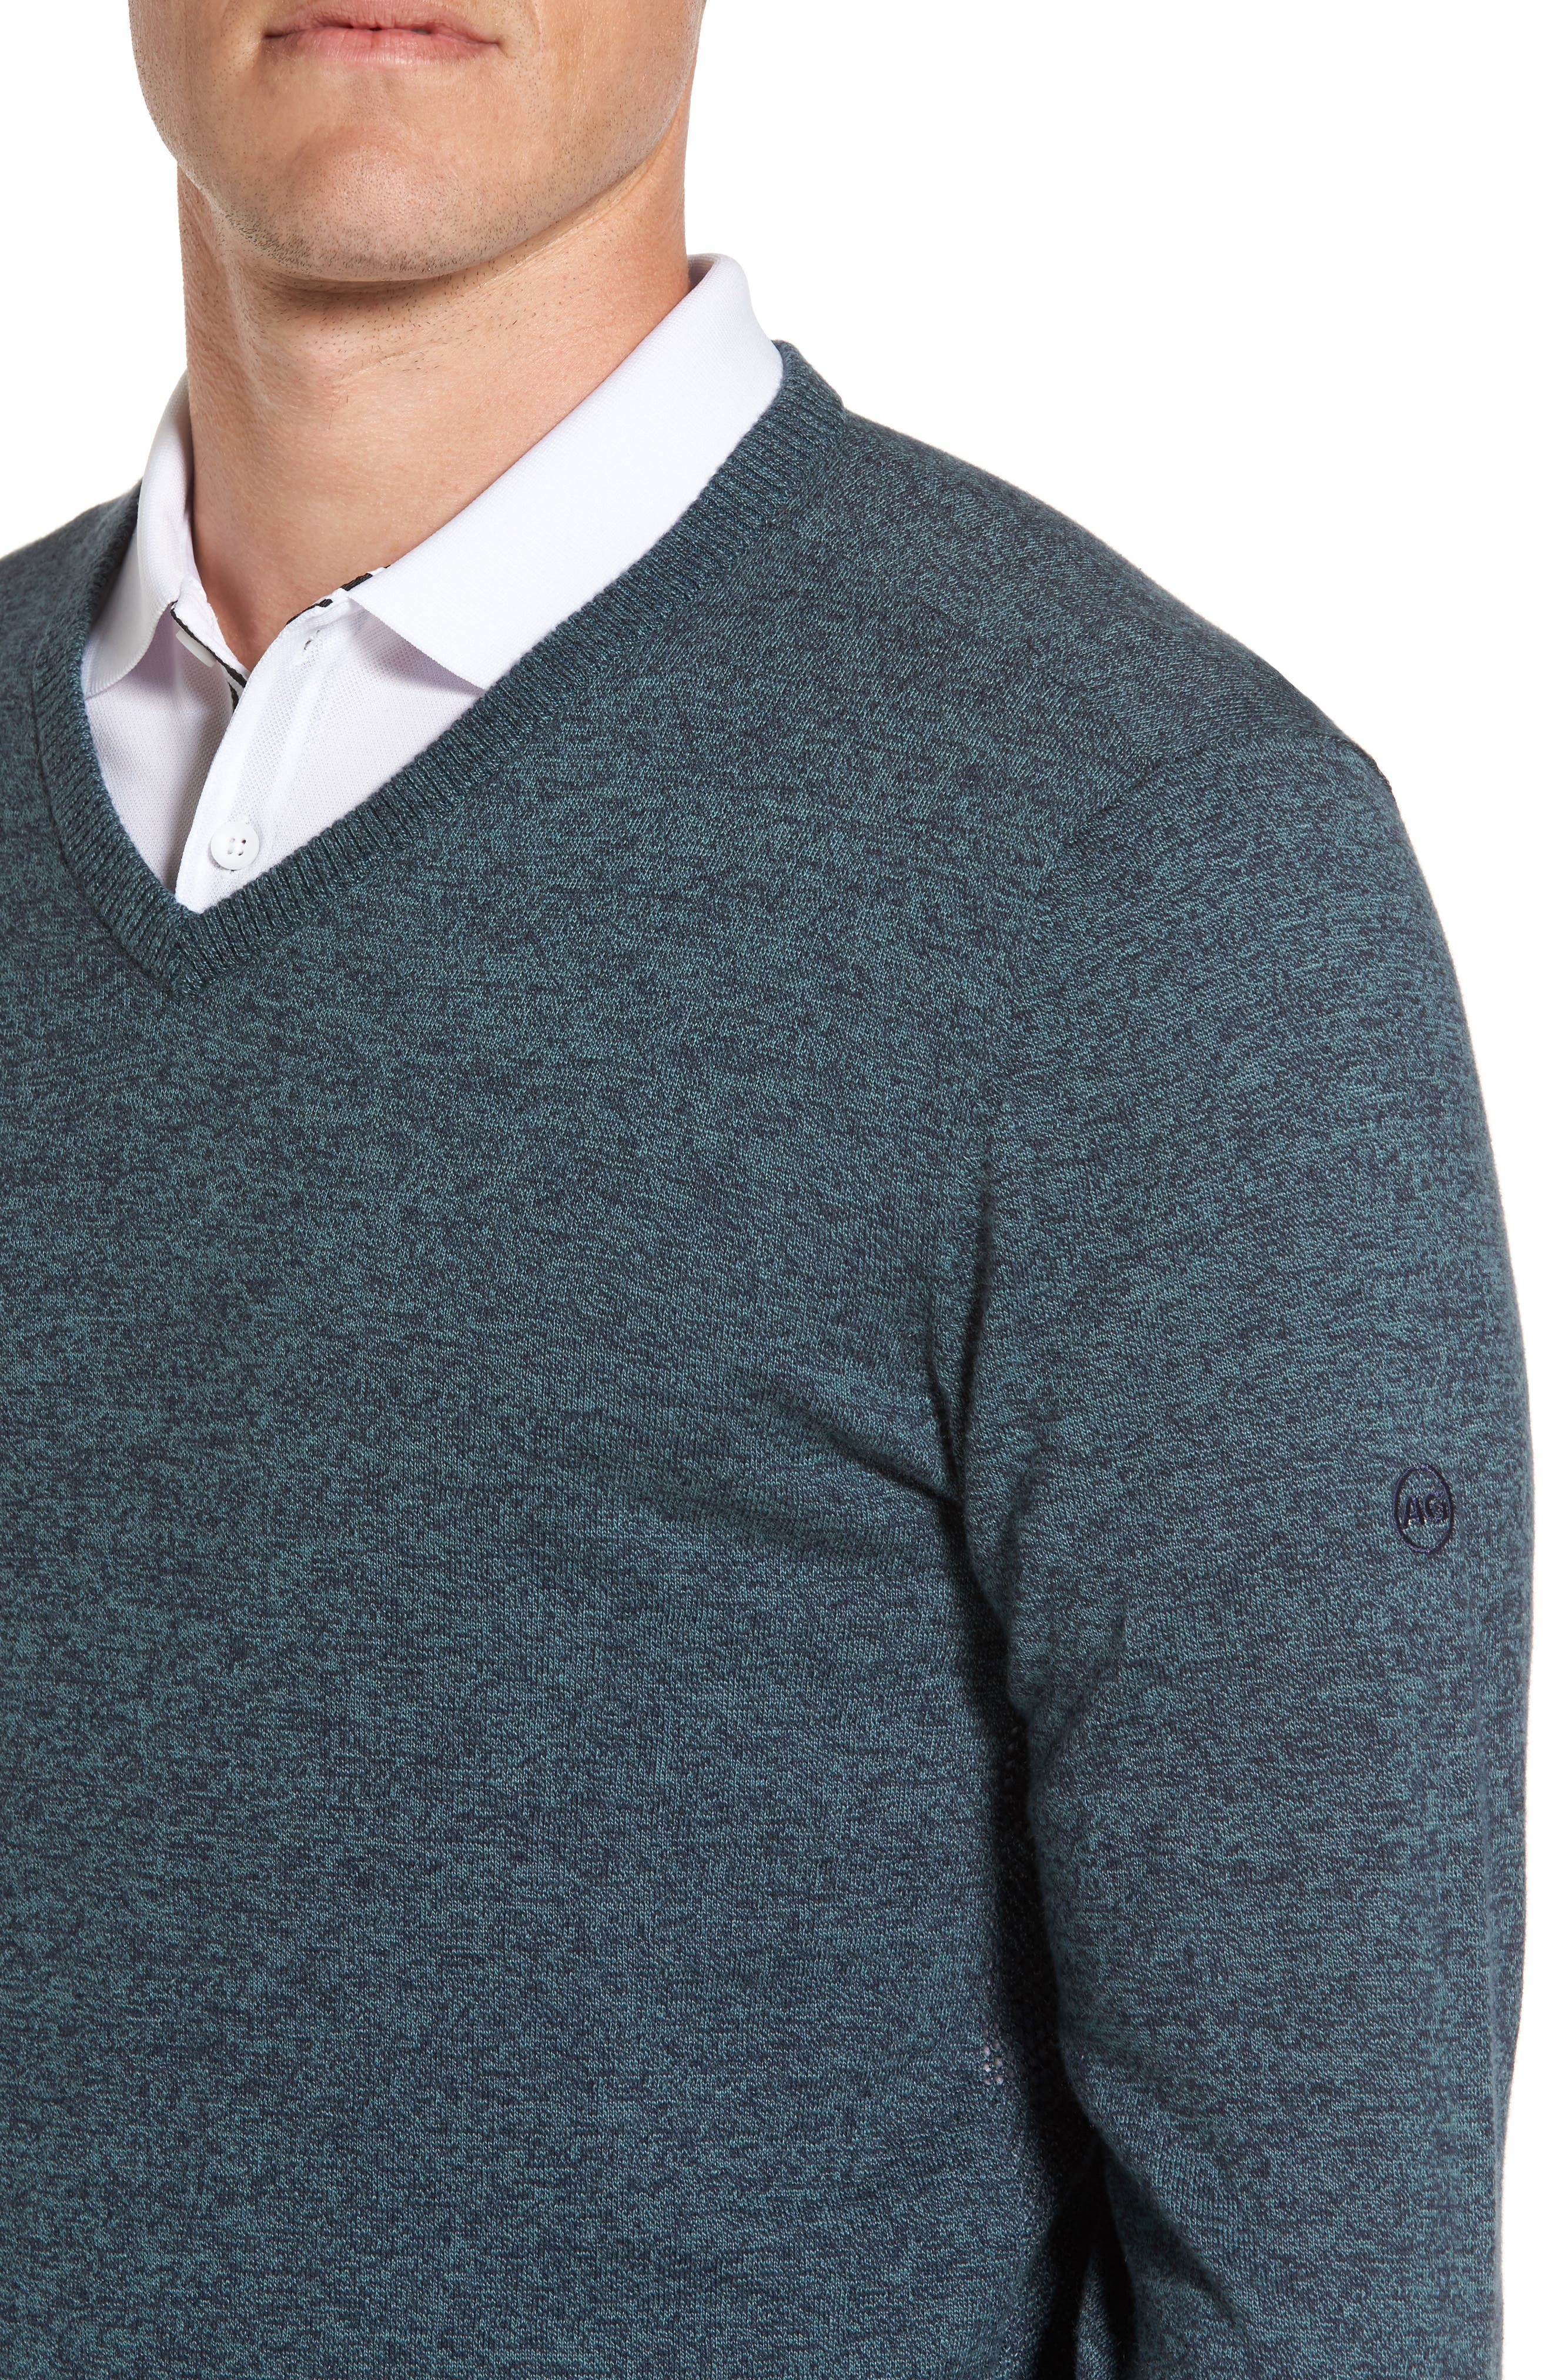 Ridgewood V-Neck Sweater,                             Alternate thumbnail 4, color,                             Turf/ Naval Blue Melange